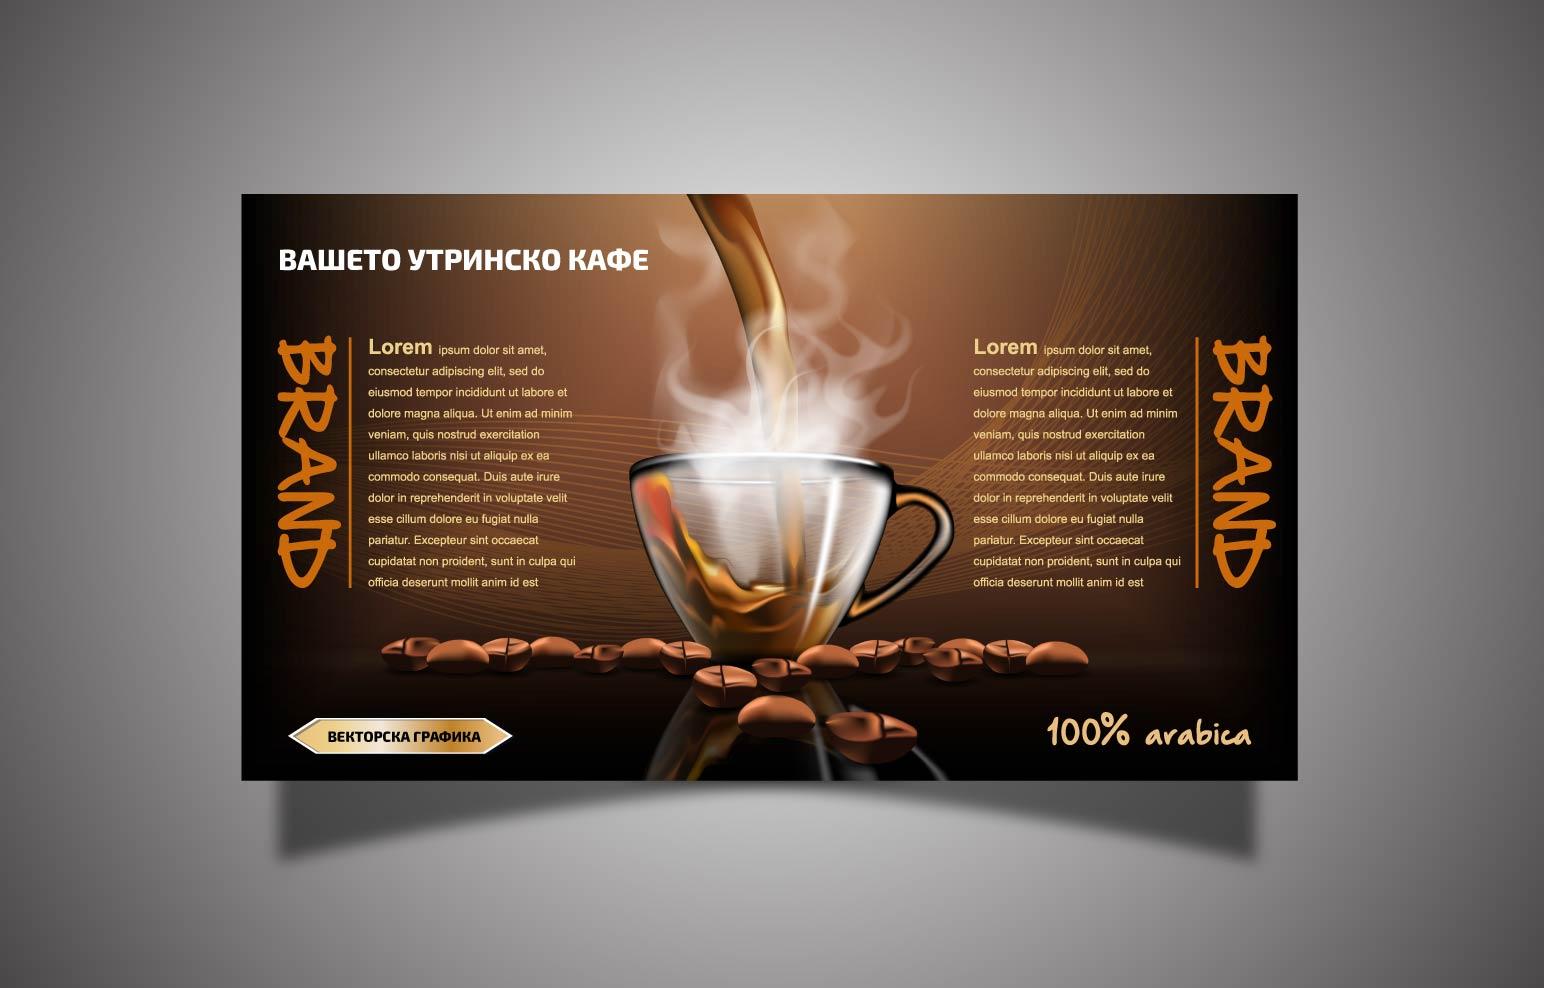 Katalog za vidovi na kafe, Каталог за видови на кафе